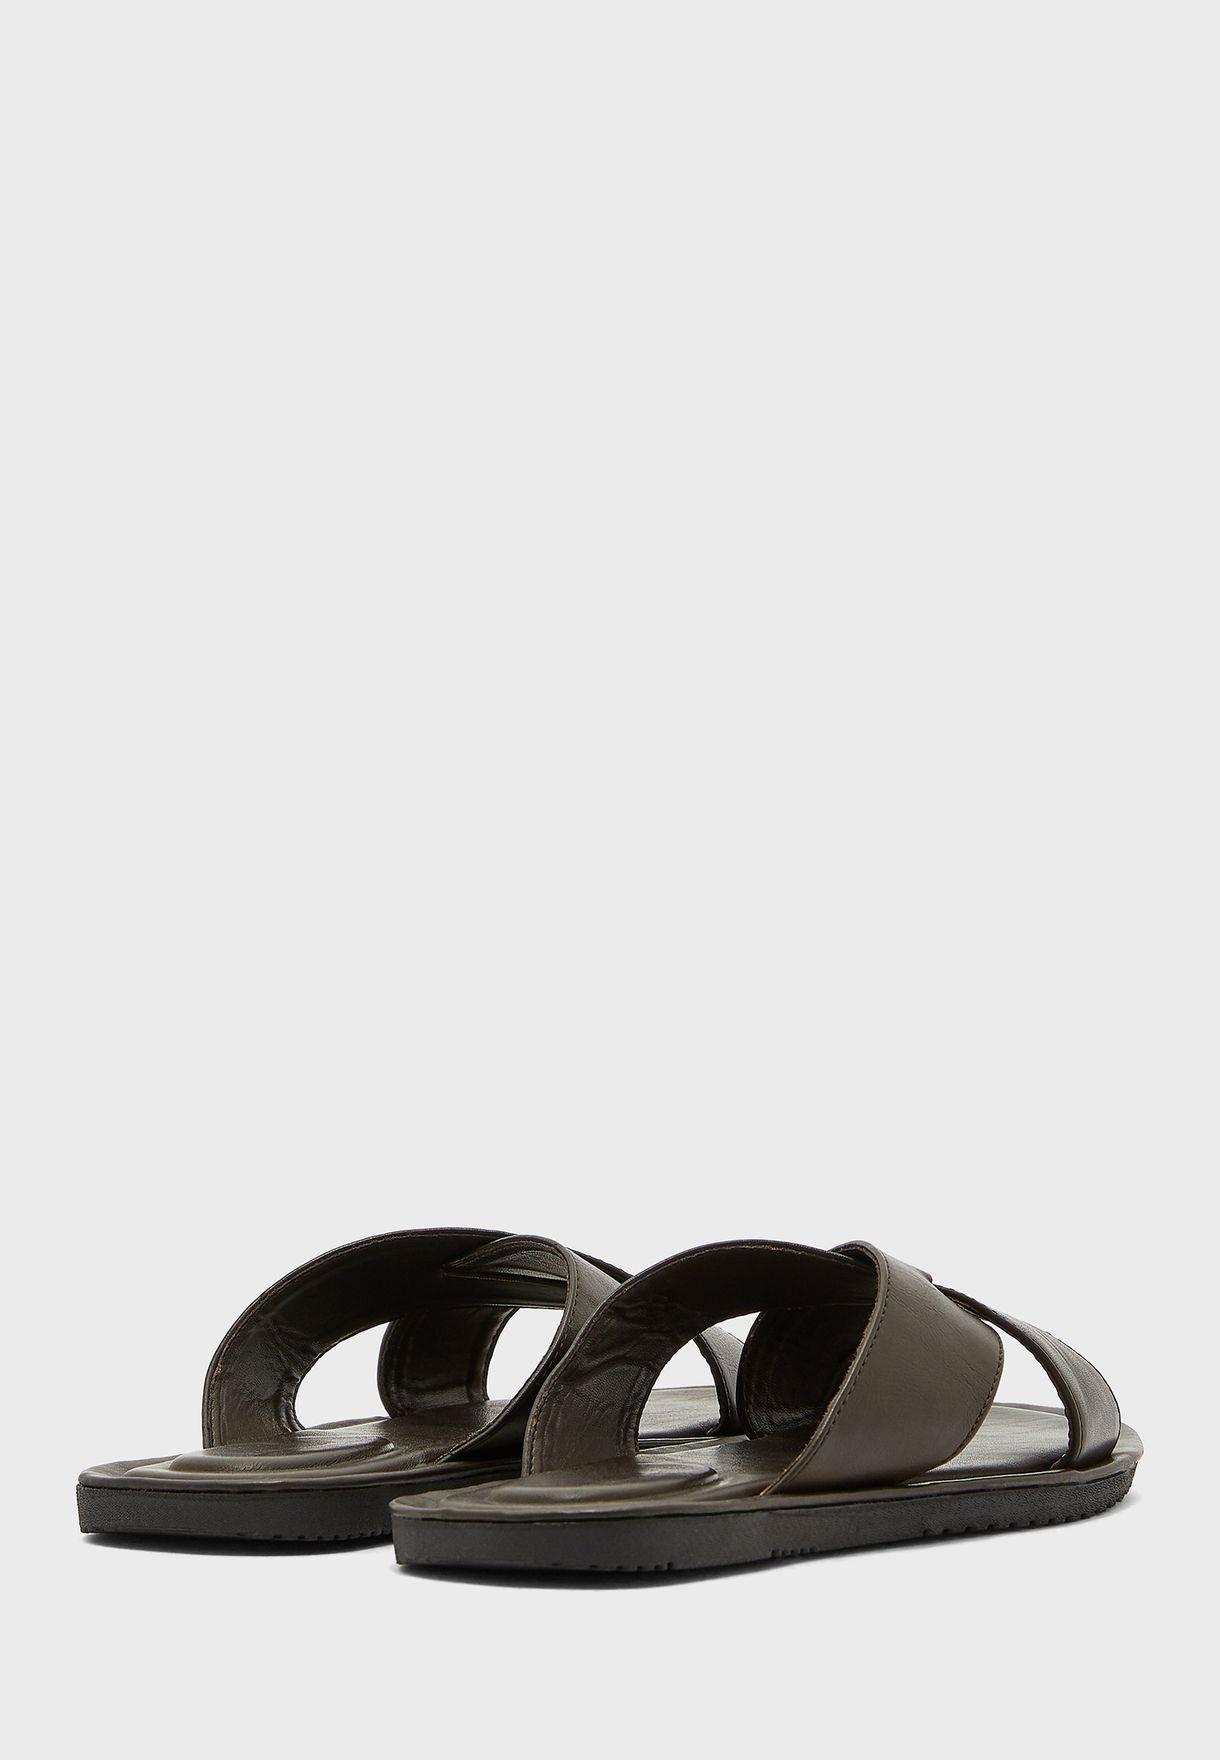 Causal Cross Strap Sandals